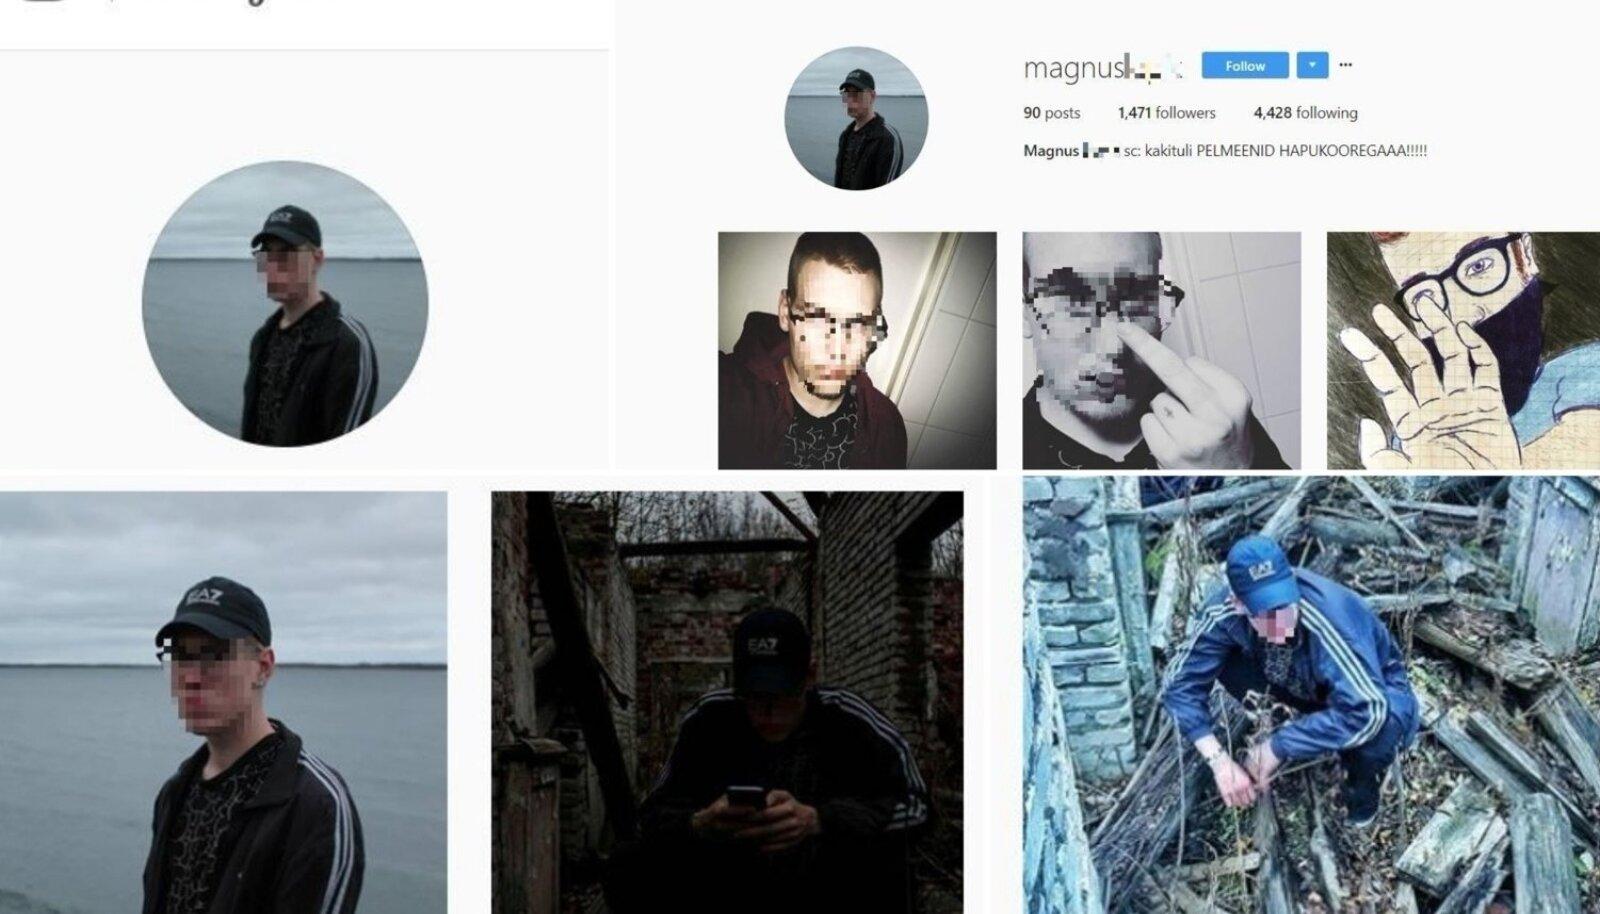 Paldiski tapja Instagrami konto